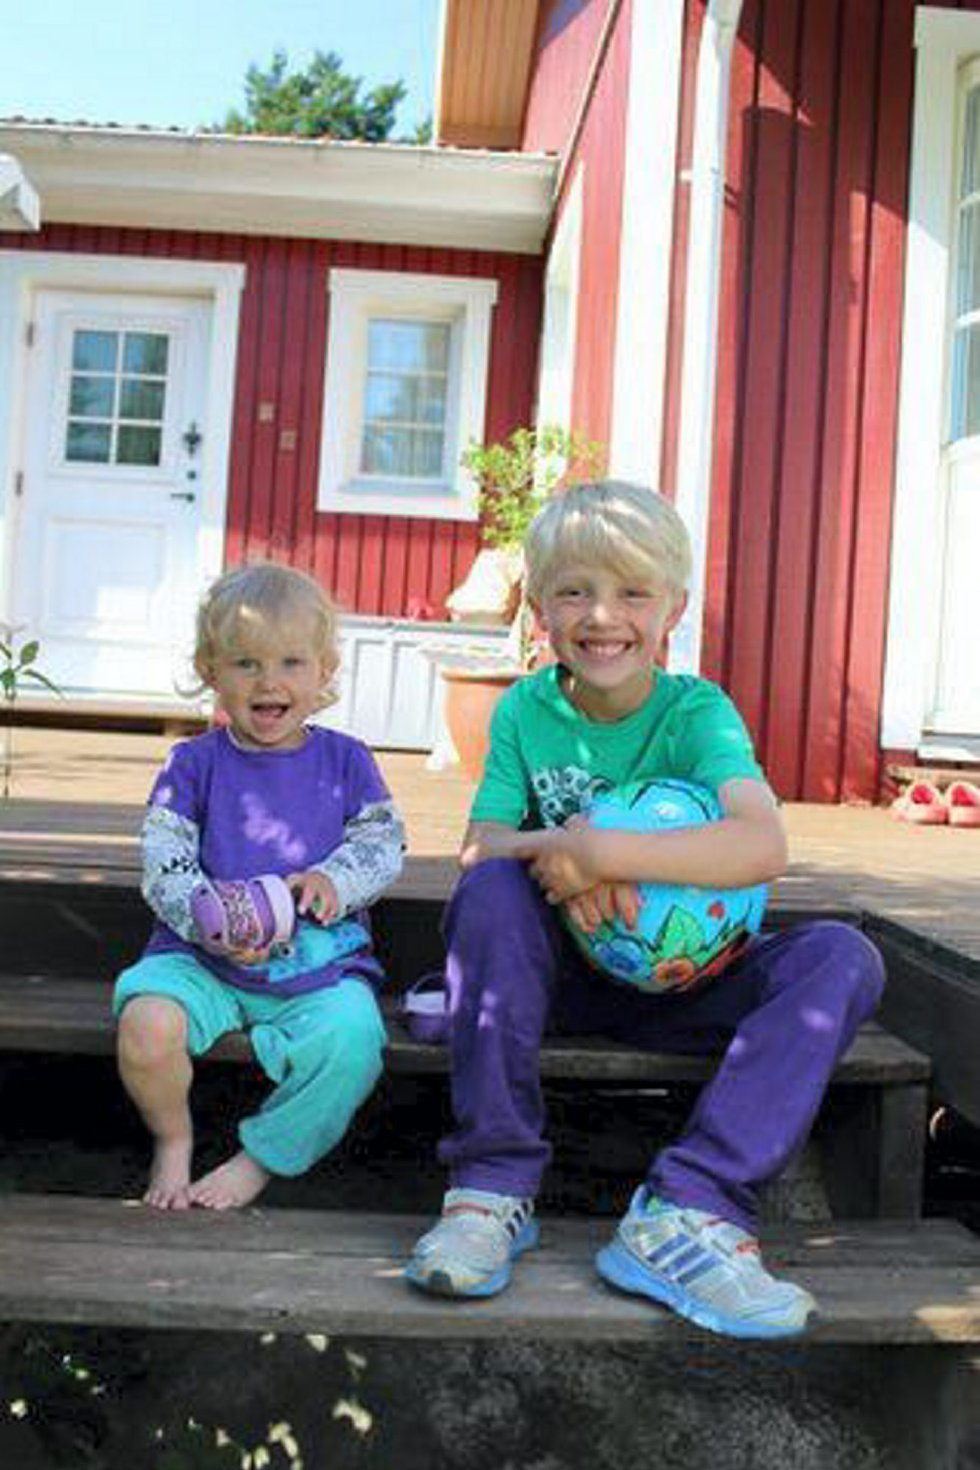 Lukas og Linnea Holmemo Hallberg koser seg på trammen en tidlig morgen! Hilsen Mormor. Foto: Sissel Holmemo. (Foto: )